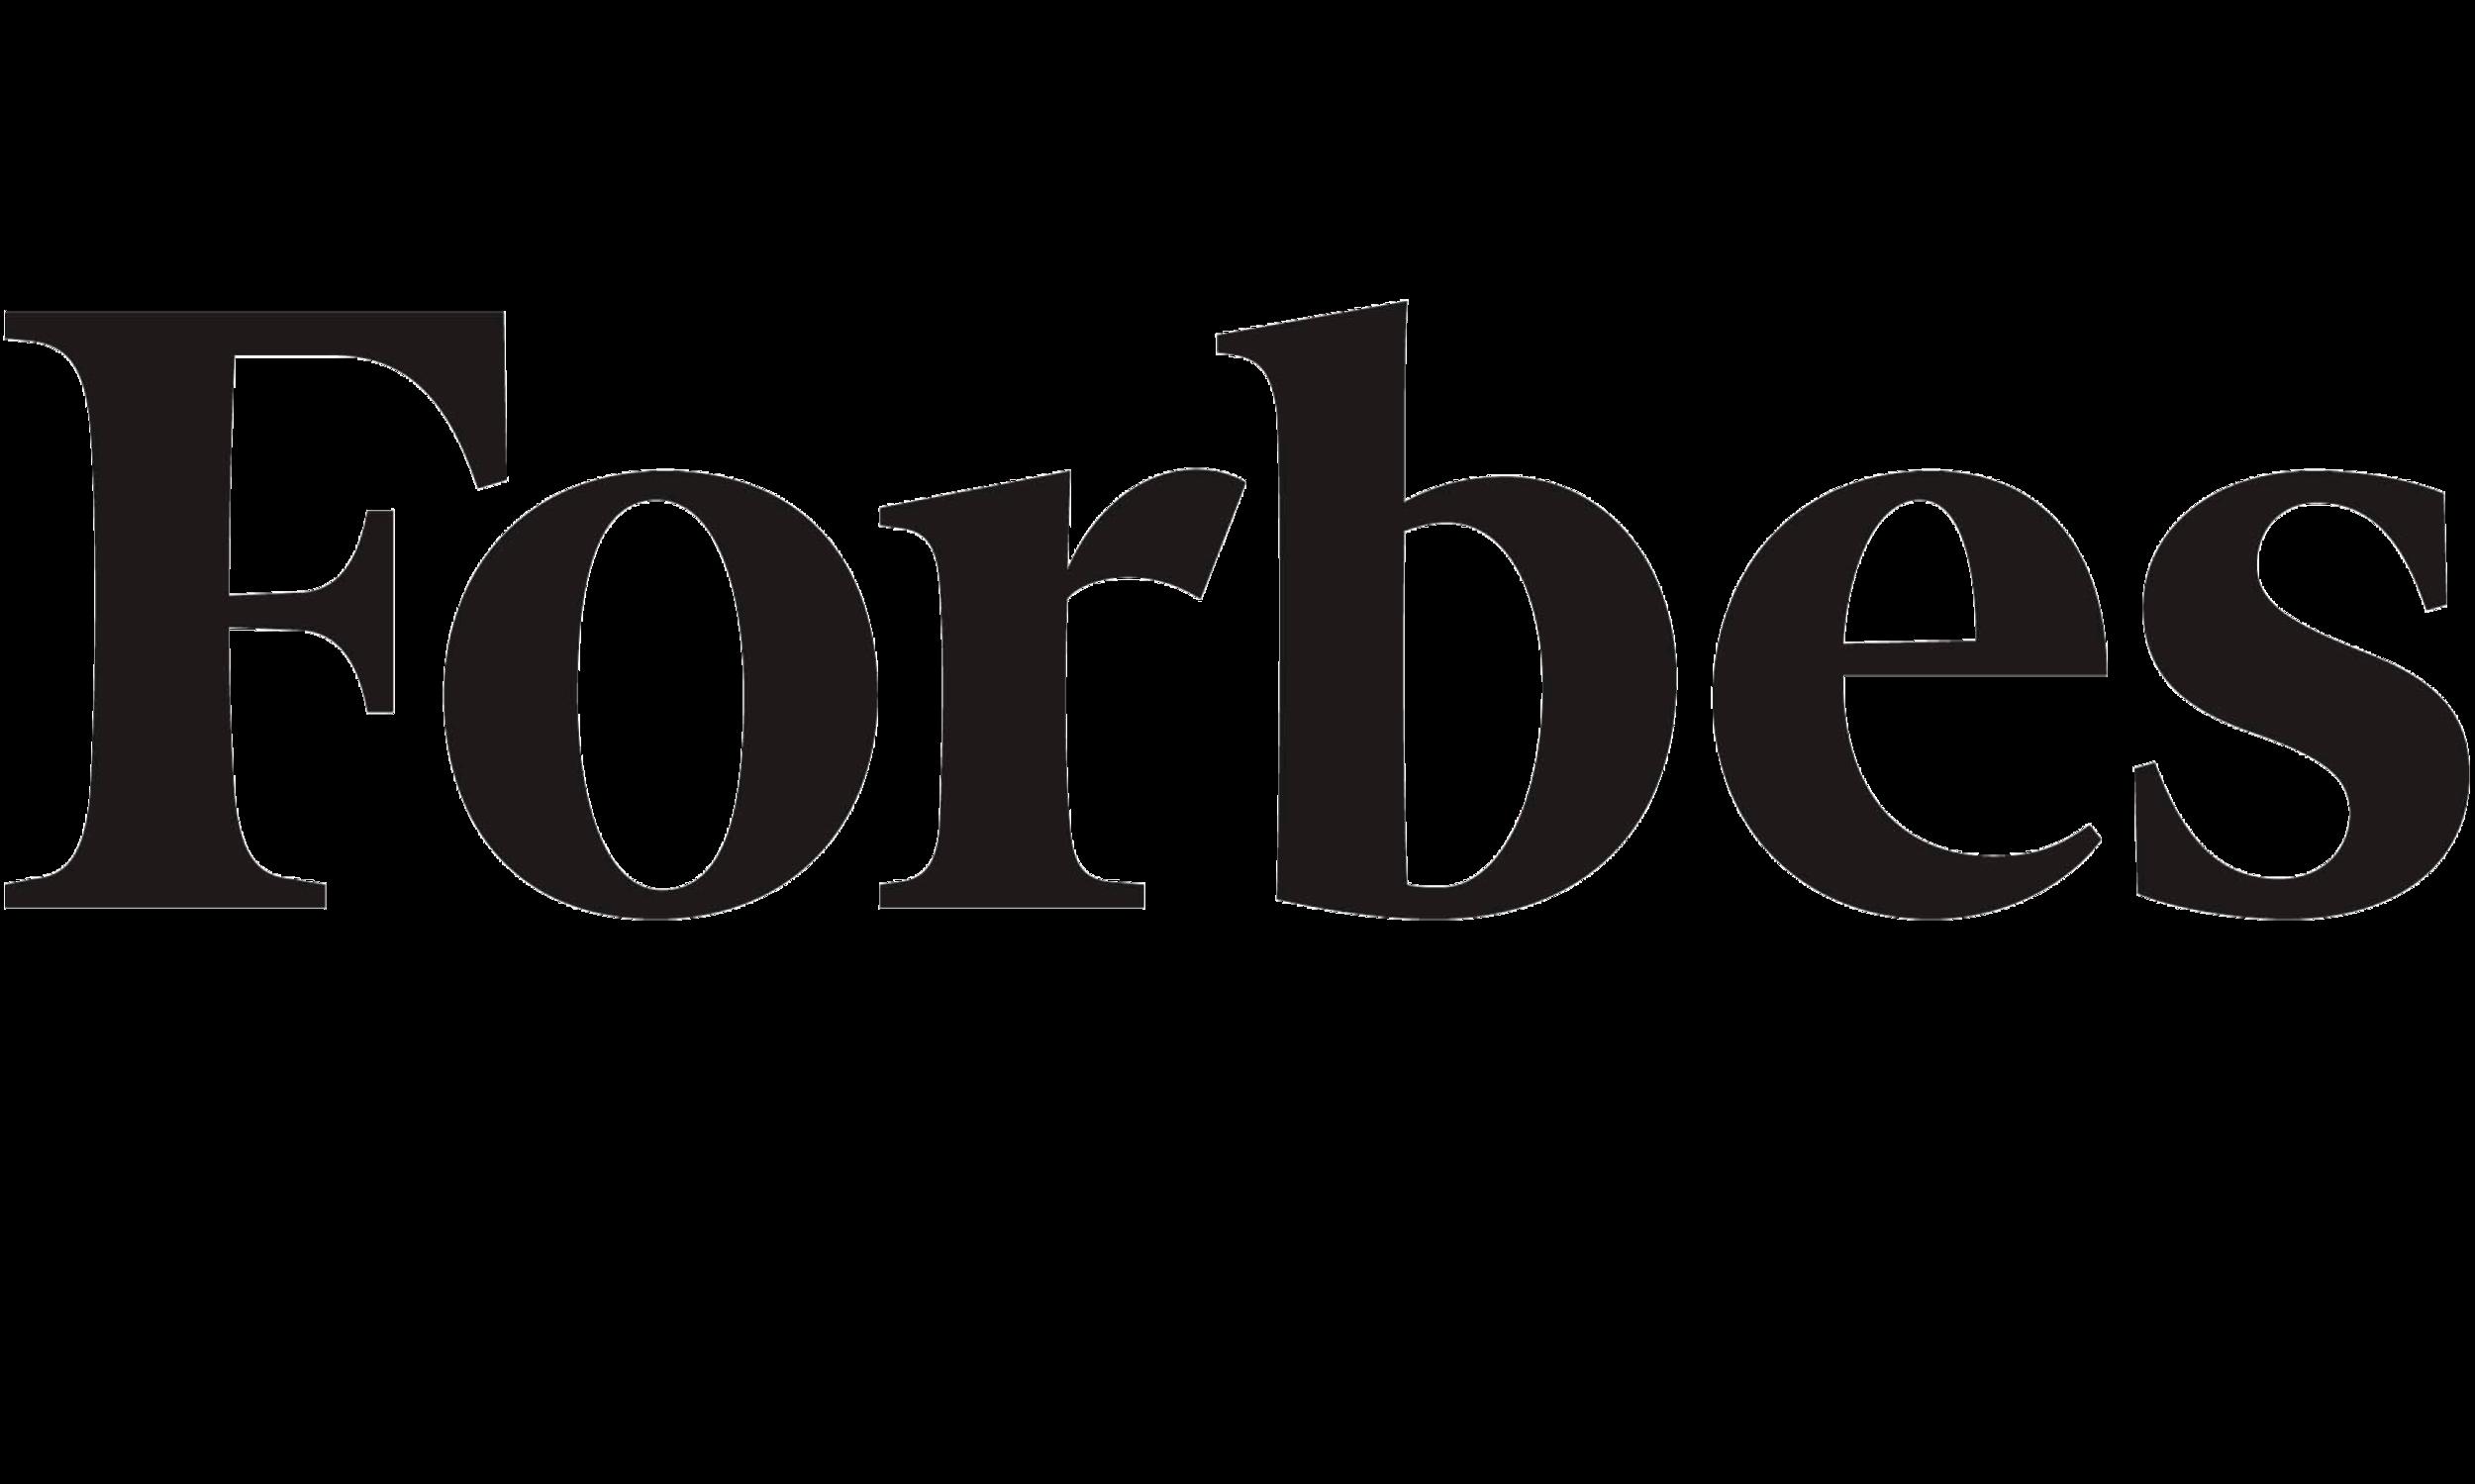 Forbes-Black-Logo-PNG-03003-2 (3).png